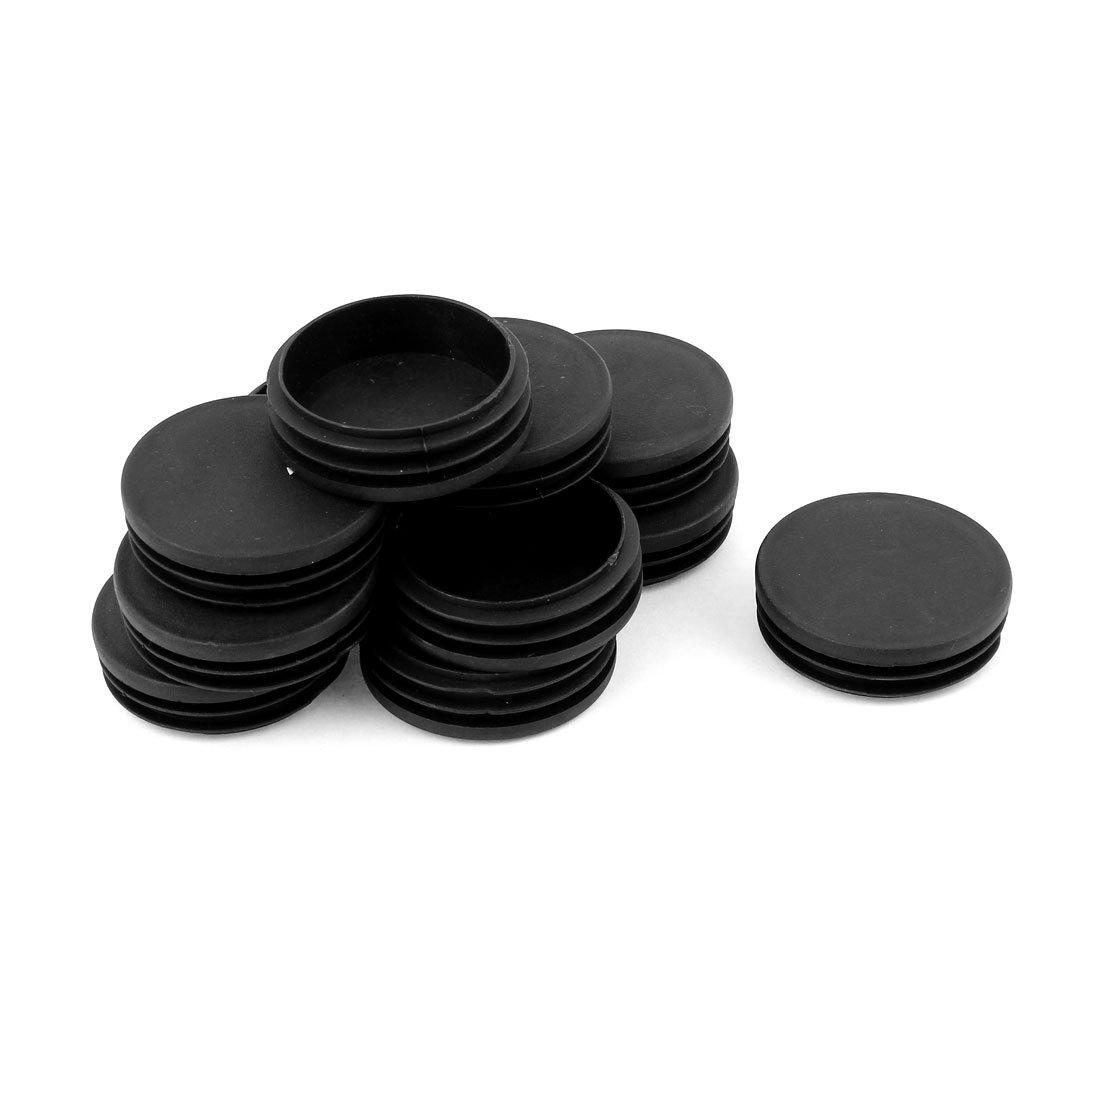 Plastic Round Tube Insert Blanking End Caps 60mm Dia 12 Pcs Black